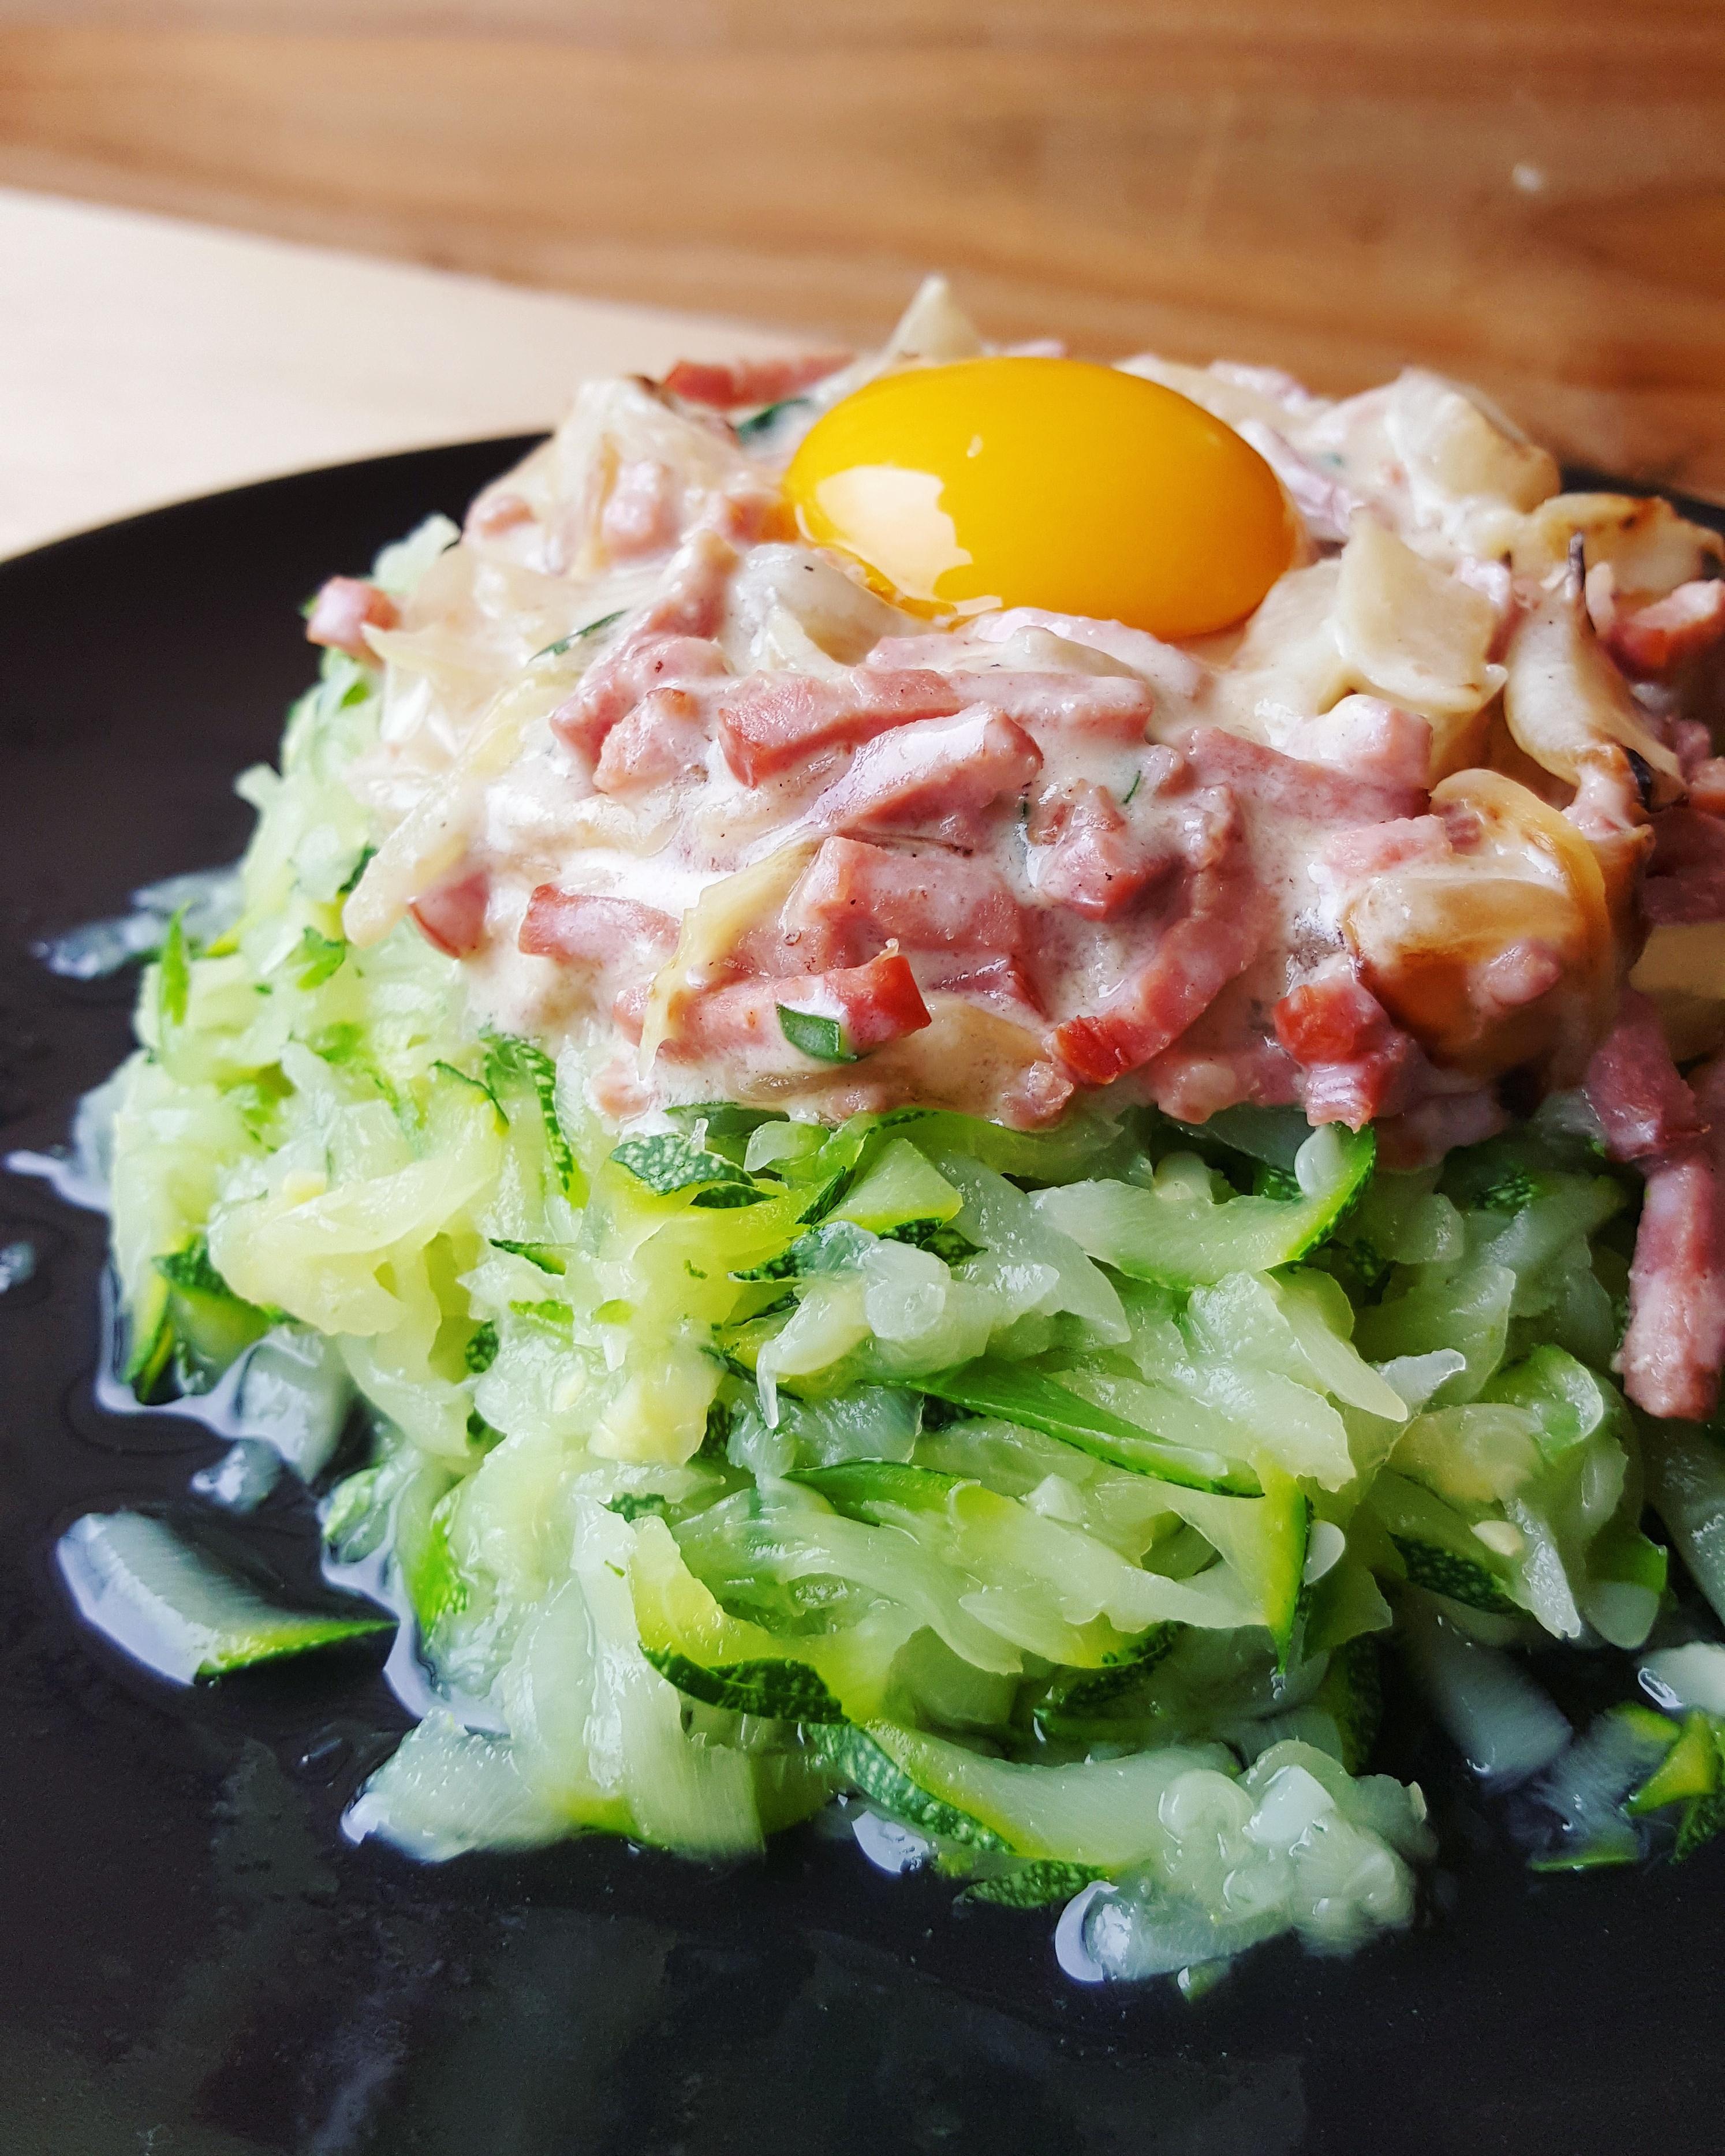 Tagliatelles de courgette la carbonara cuisine ta ligne for Cuisine ta ligne